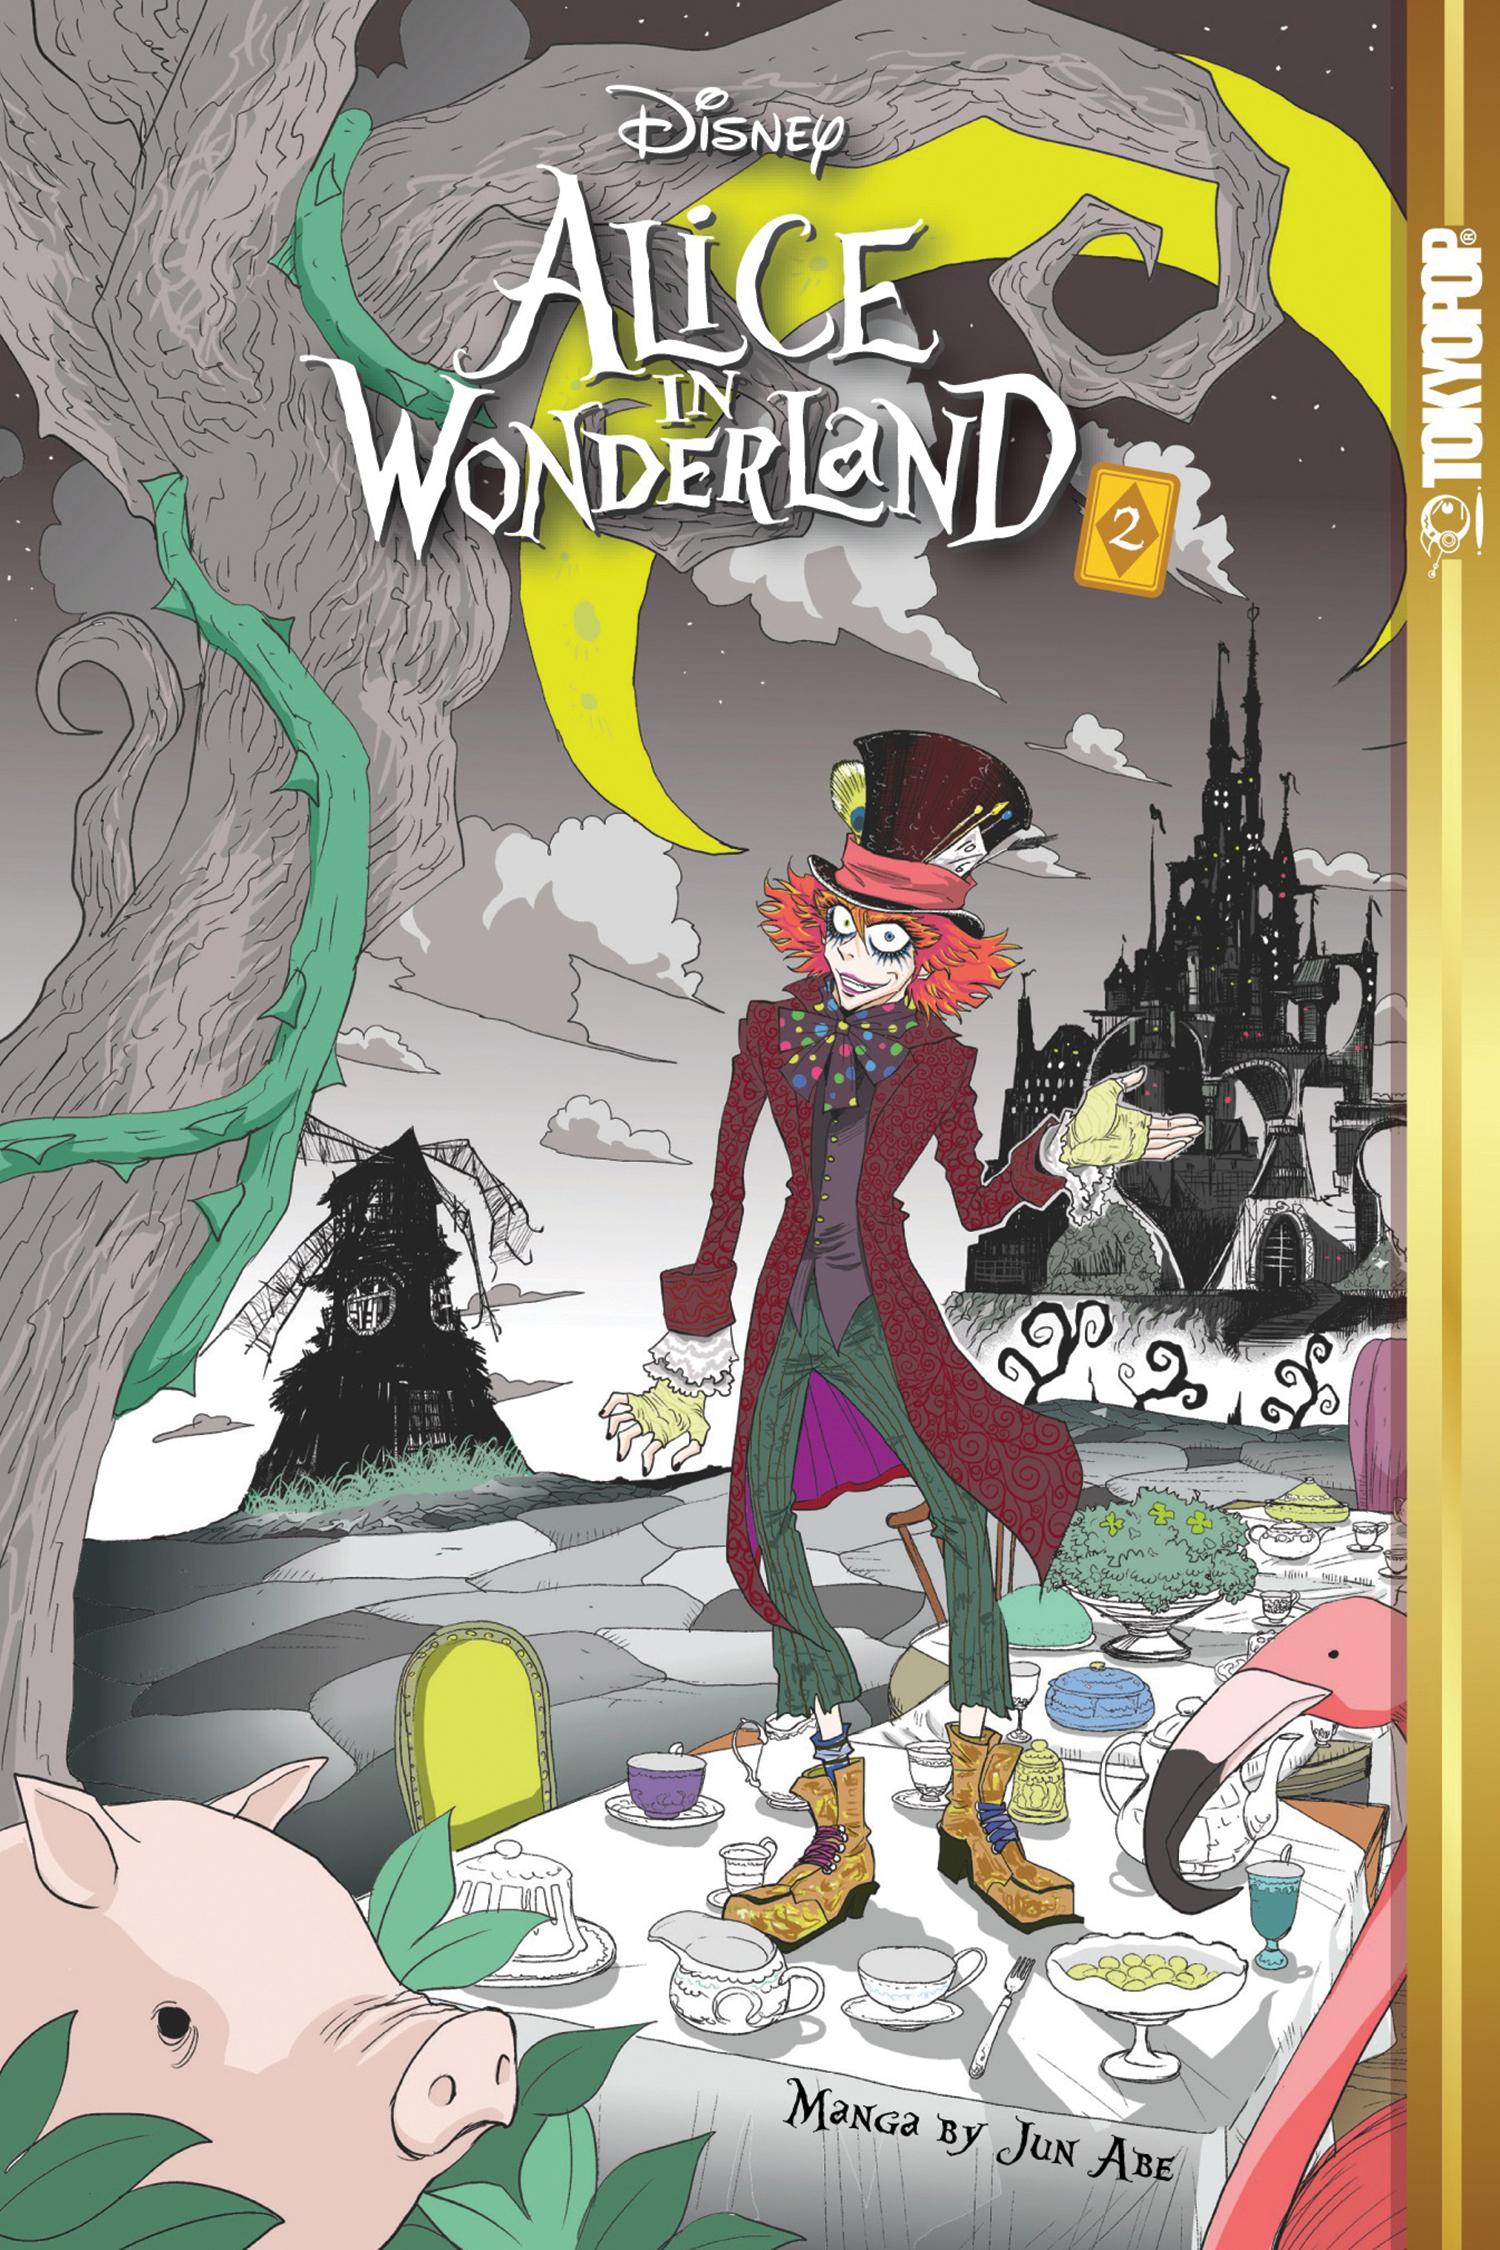 Disney Alice in Wonderland, Vol. 2 (ebook version)